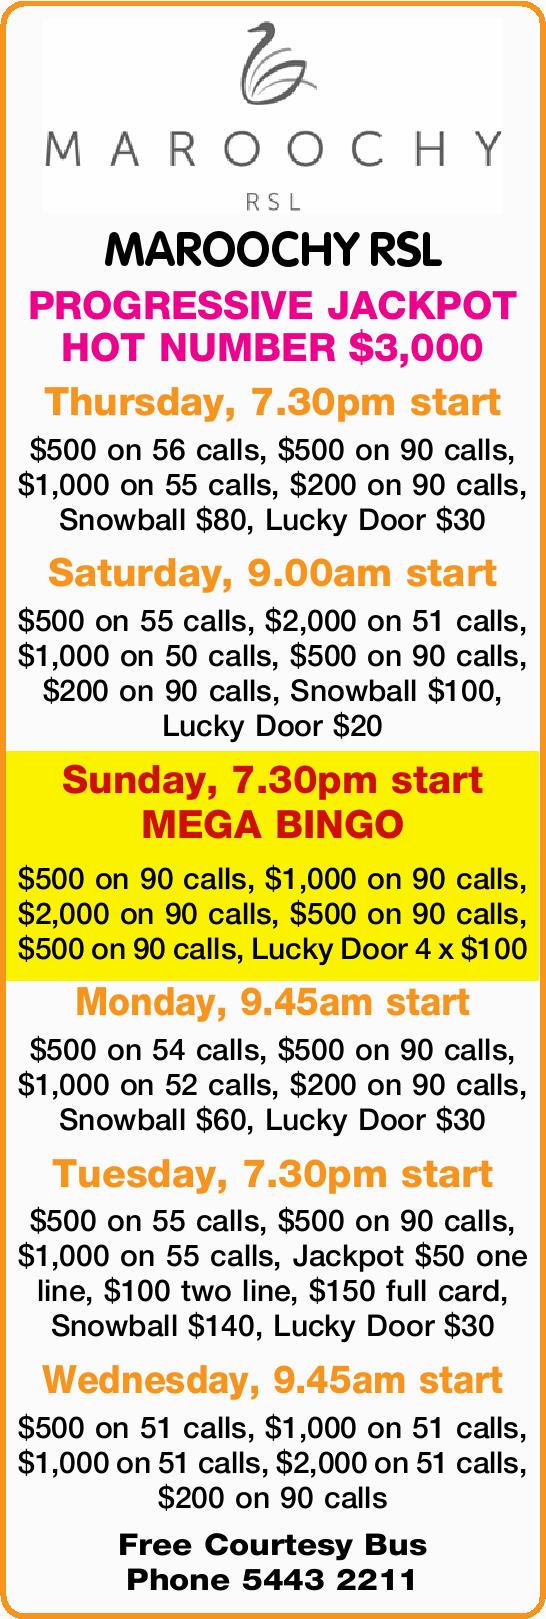 MAROOCHY RSL PROGRESSIVE JACKPOT HOT NUMBER $3,000 Thursday, 7.30pm start $500 on 56 calls, $500...